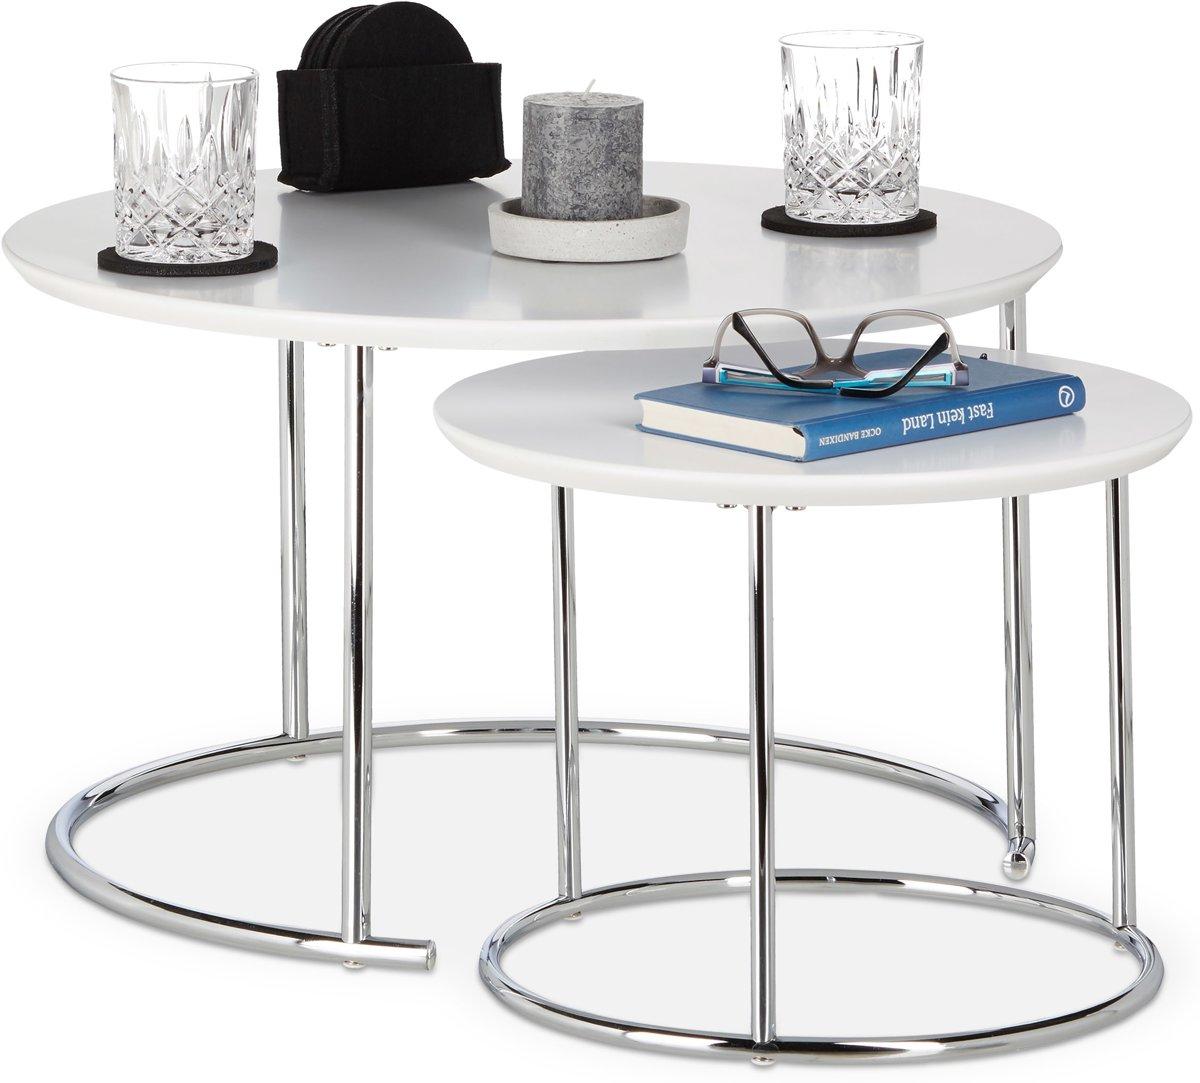 Salontafel Set Rond Wit.Top Honderd Relaxdays Bijzettafel 2er Set Nest Tafels Rond